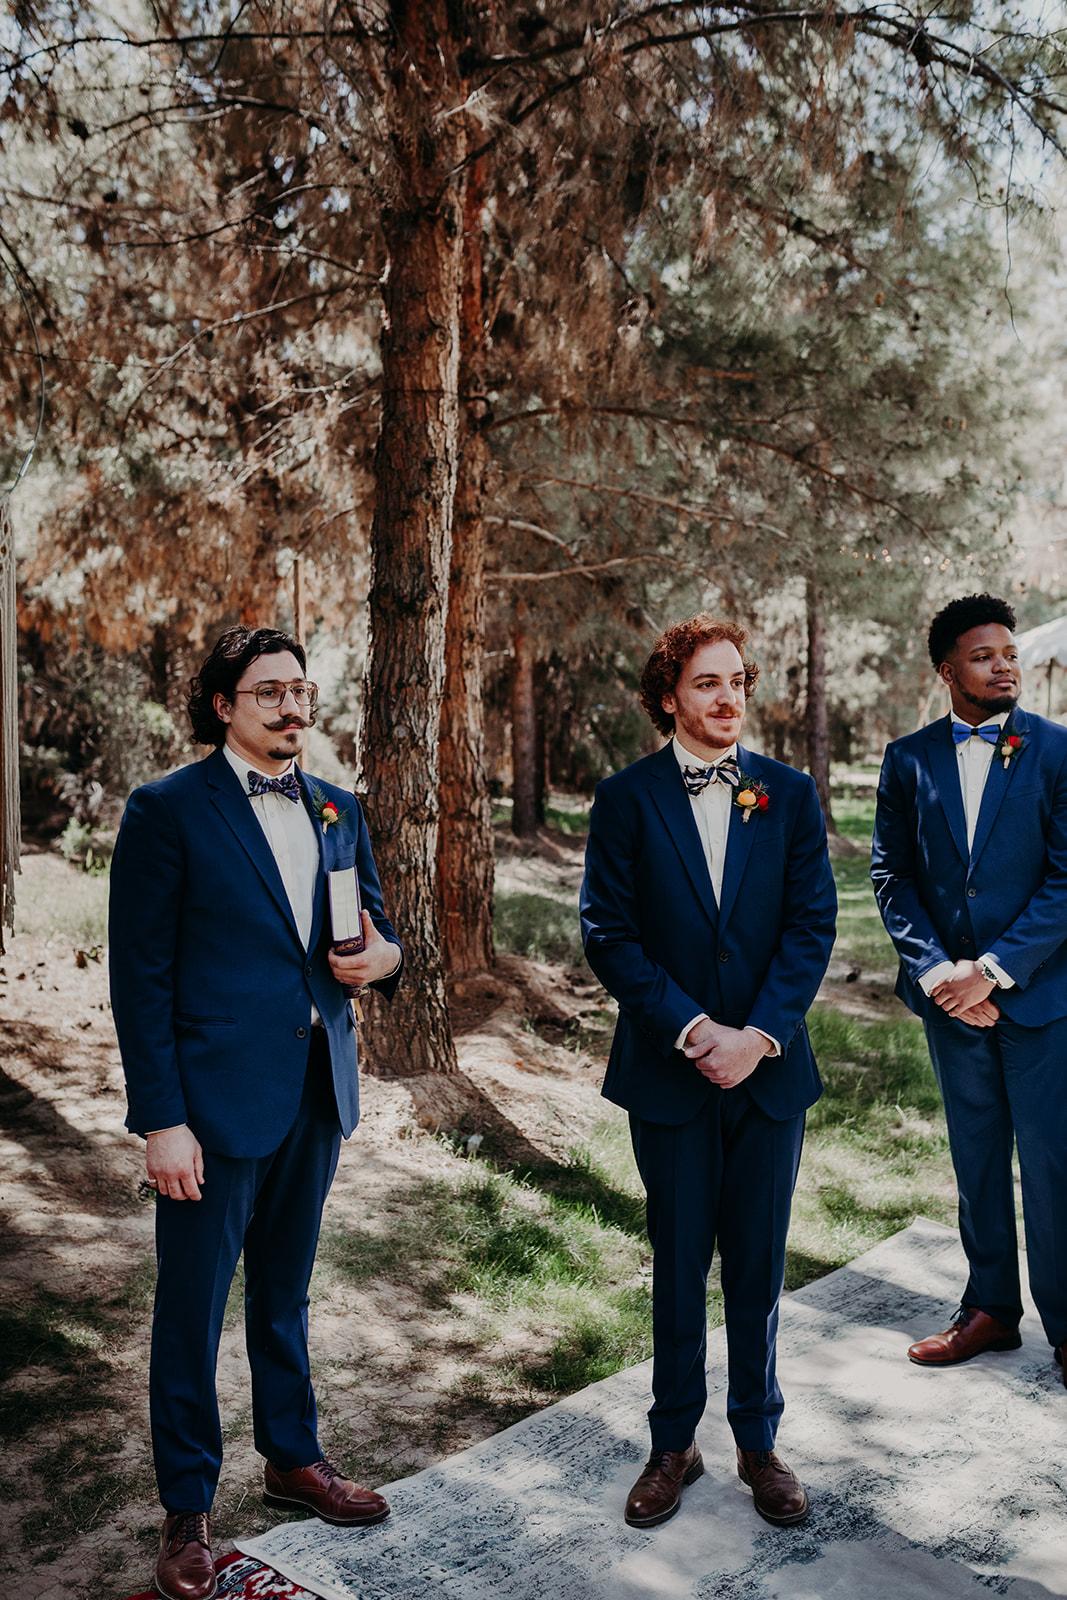 Disney Themed Wedding - Arizona florist Phoenix scottsdale Mesa chandler Sedona Flagstaff Prescott - Groom at Ceremony